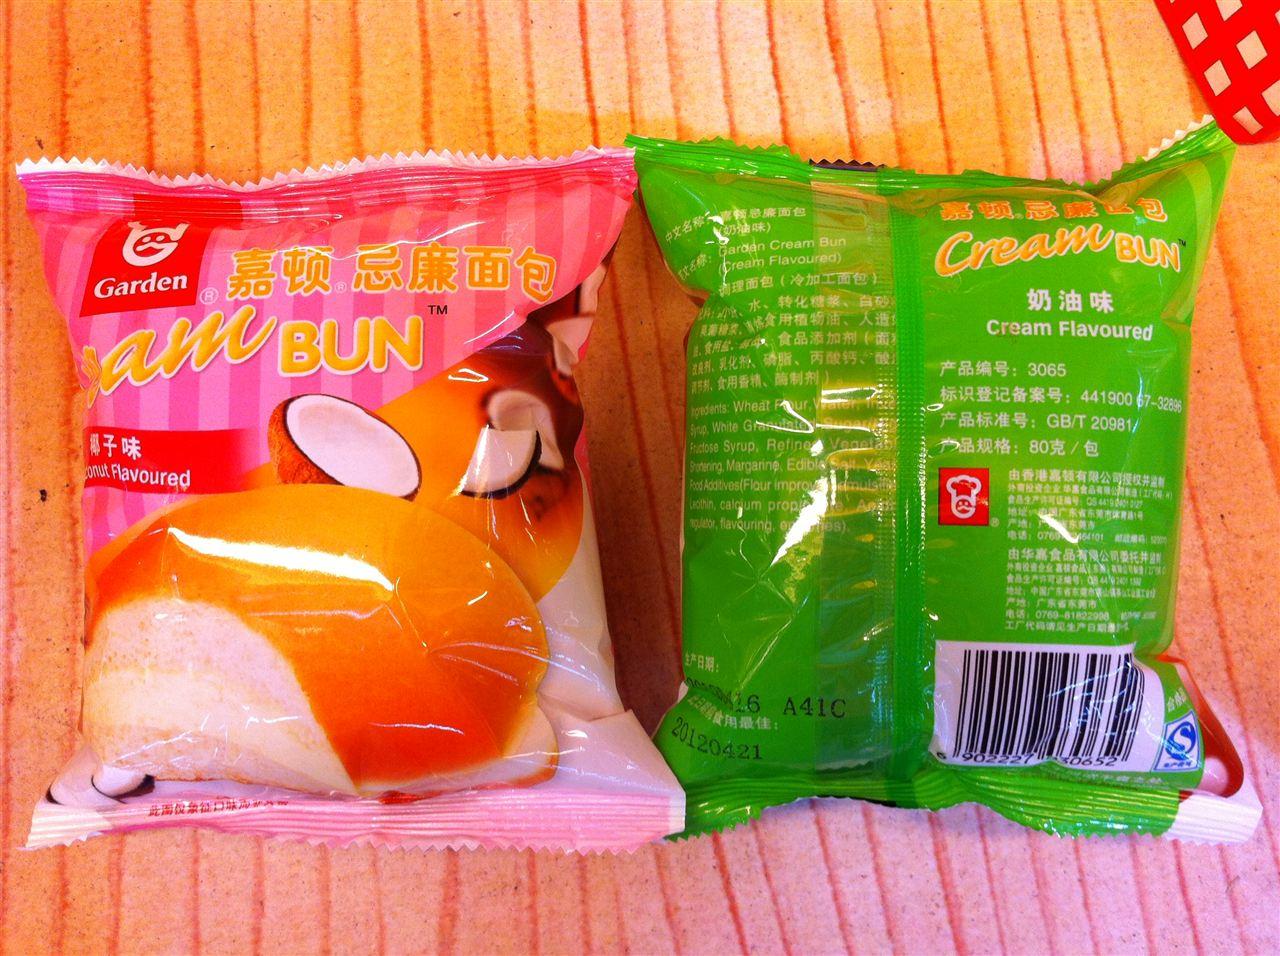 <strong>嘉顿忌廉面包自动包装机 椰子味奶油味面包包装机械</strong>